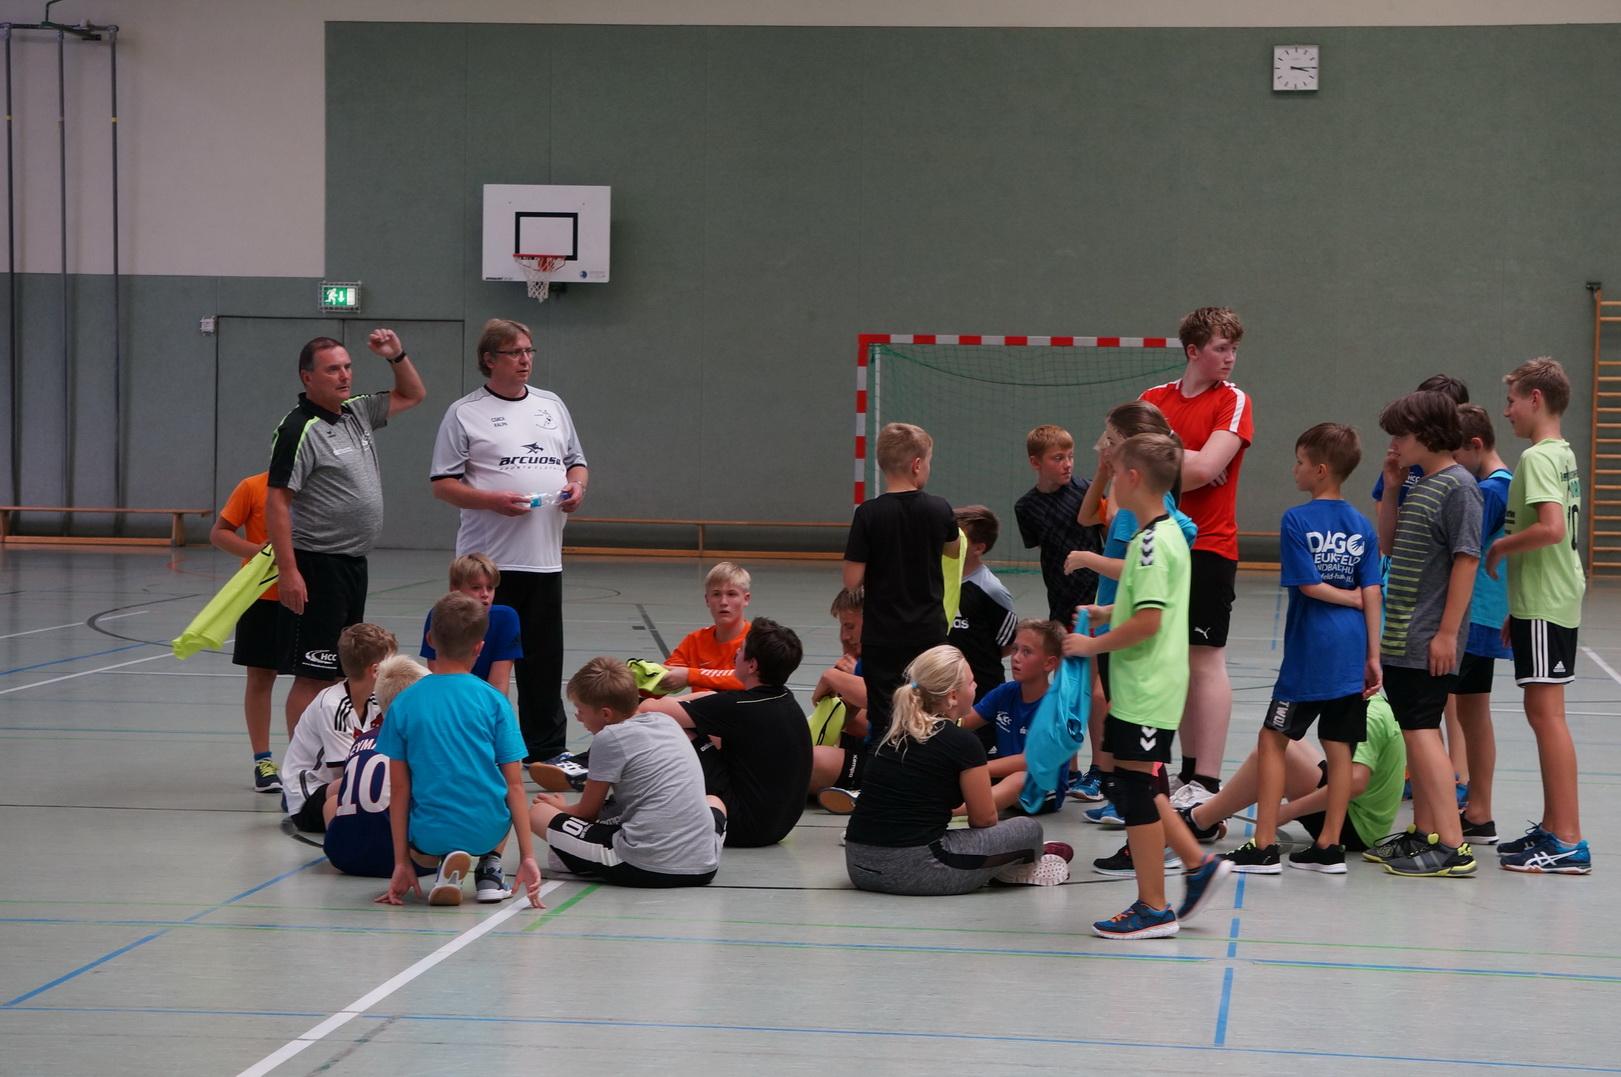 201808_Handballcamp_SDH_MG_128w